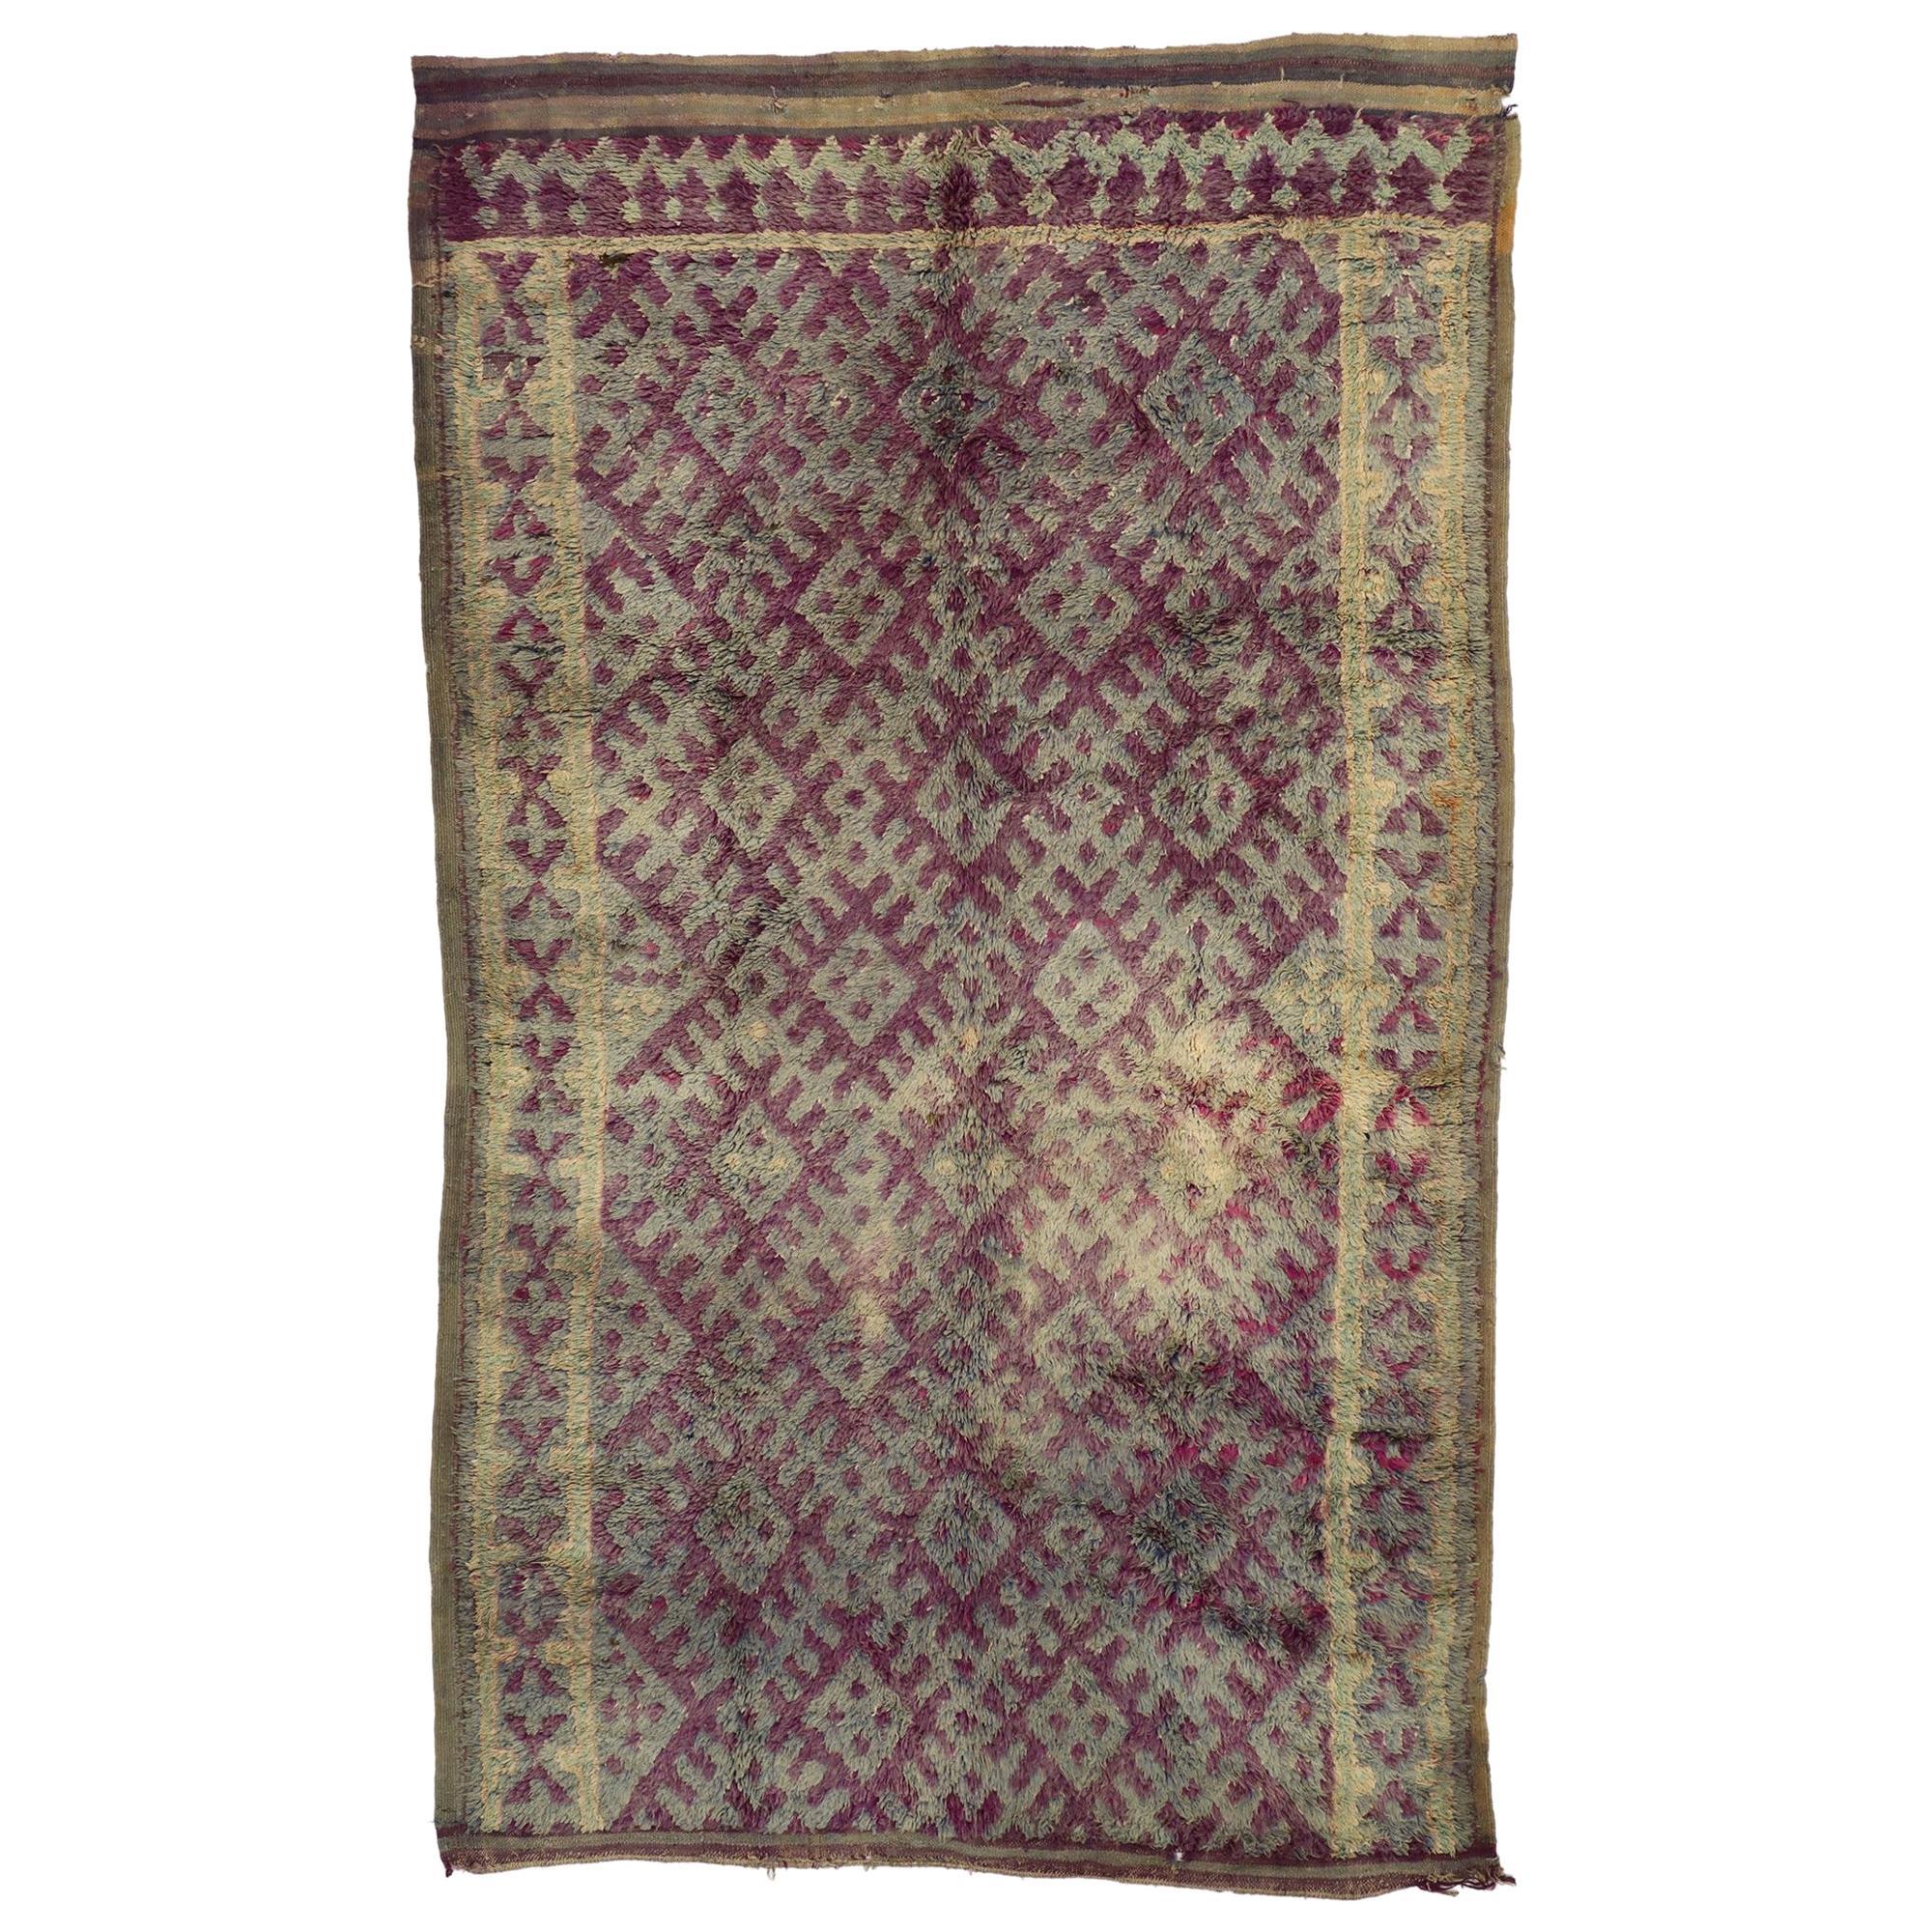 Vintage Berber Purple Boujad Moroccan Beni Mrirt Rug with Boho Chic Style